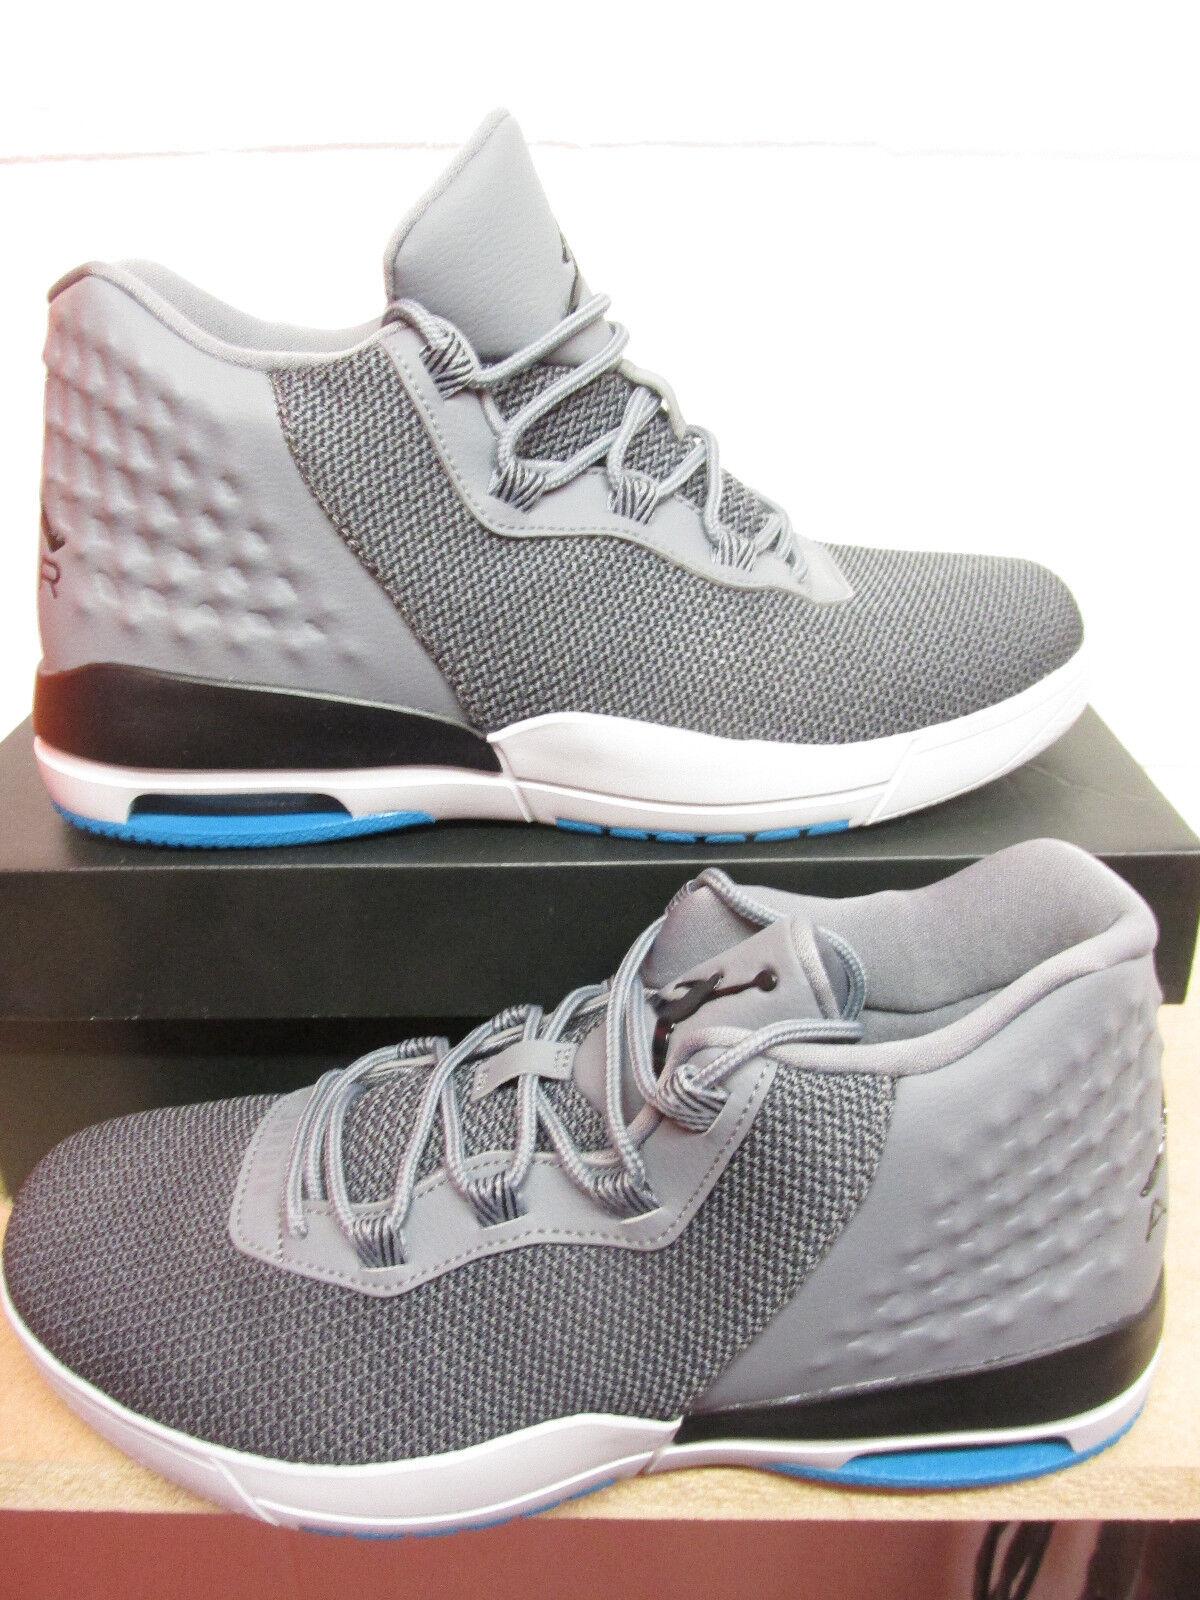 Nike Air Jordan Academy Hombre Hi Top Top Hi Trainers 844515 015 Sneakers Zapatos 805735